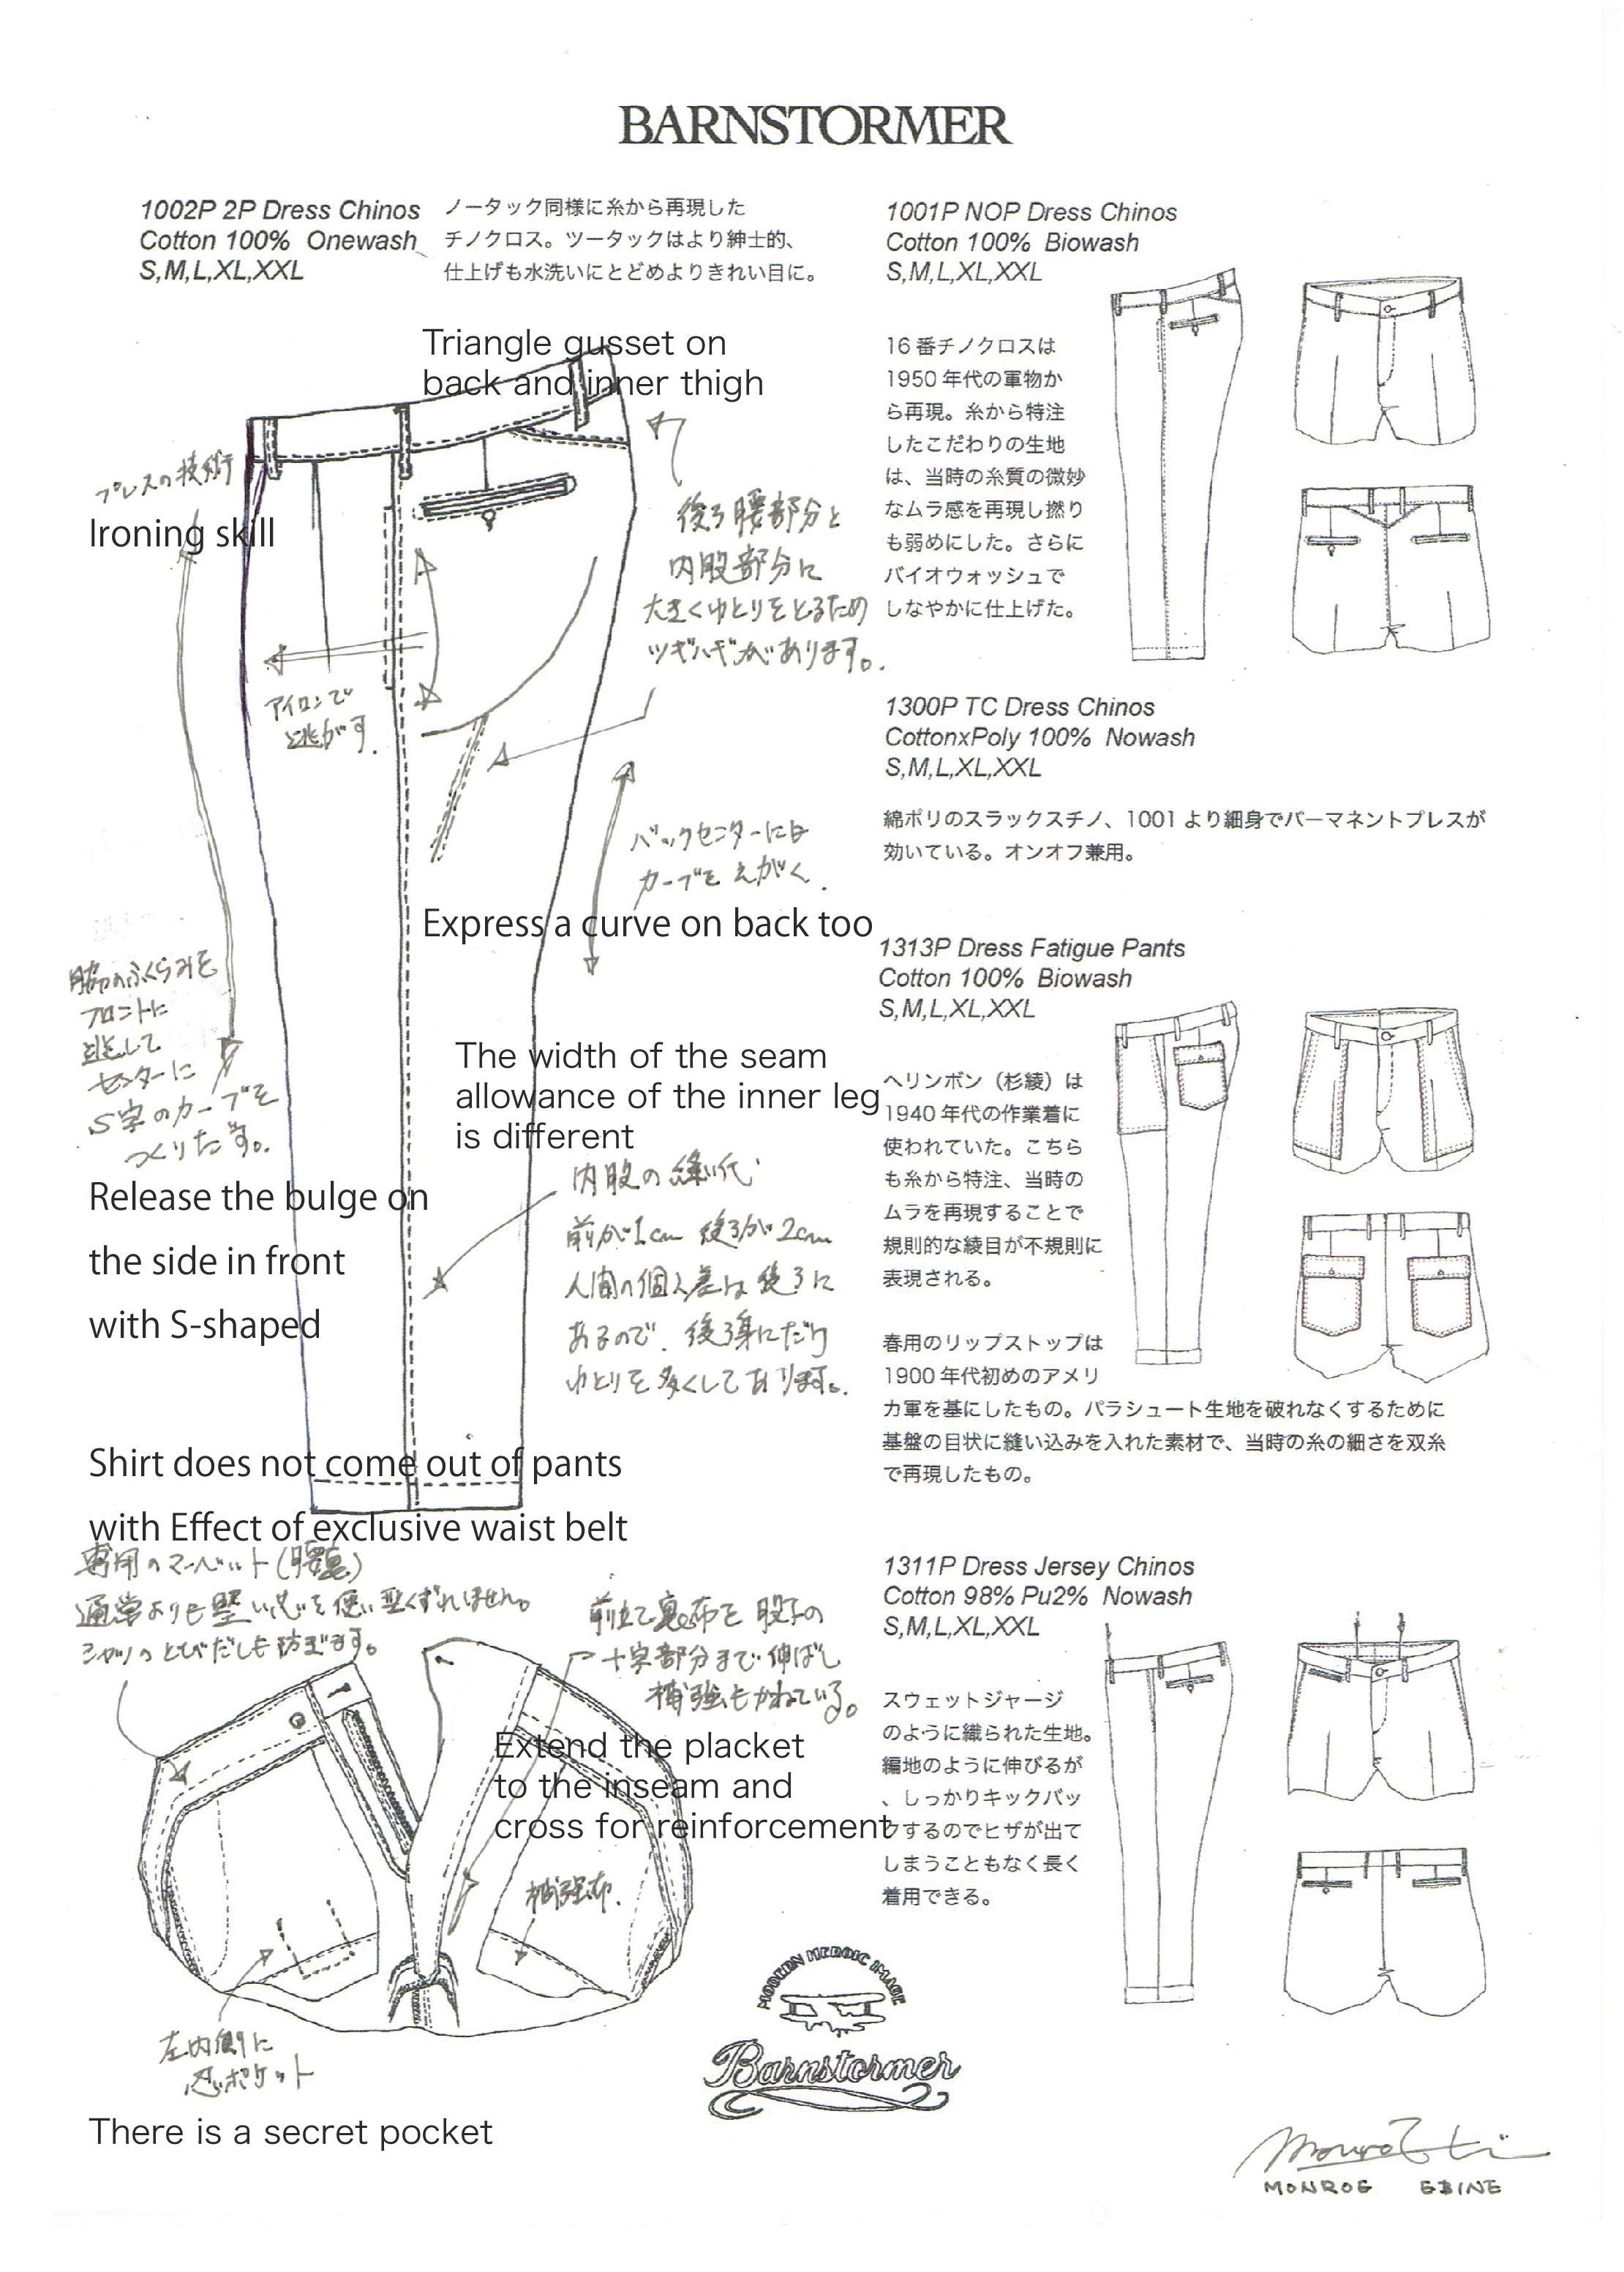 BSDTLforENGnFRN-page-001.jpg